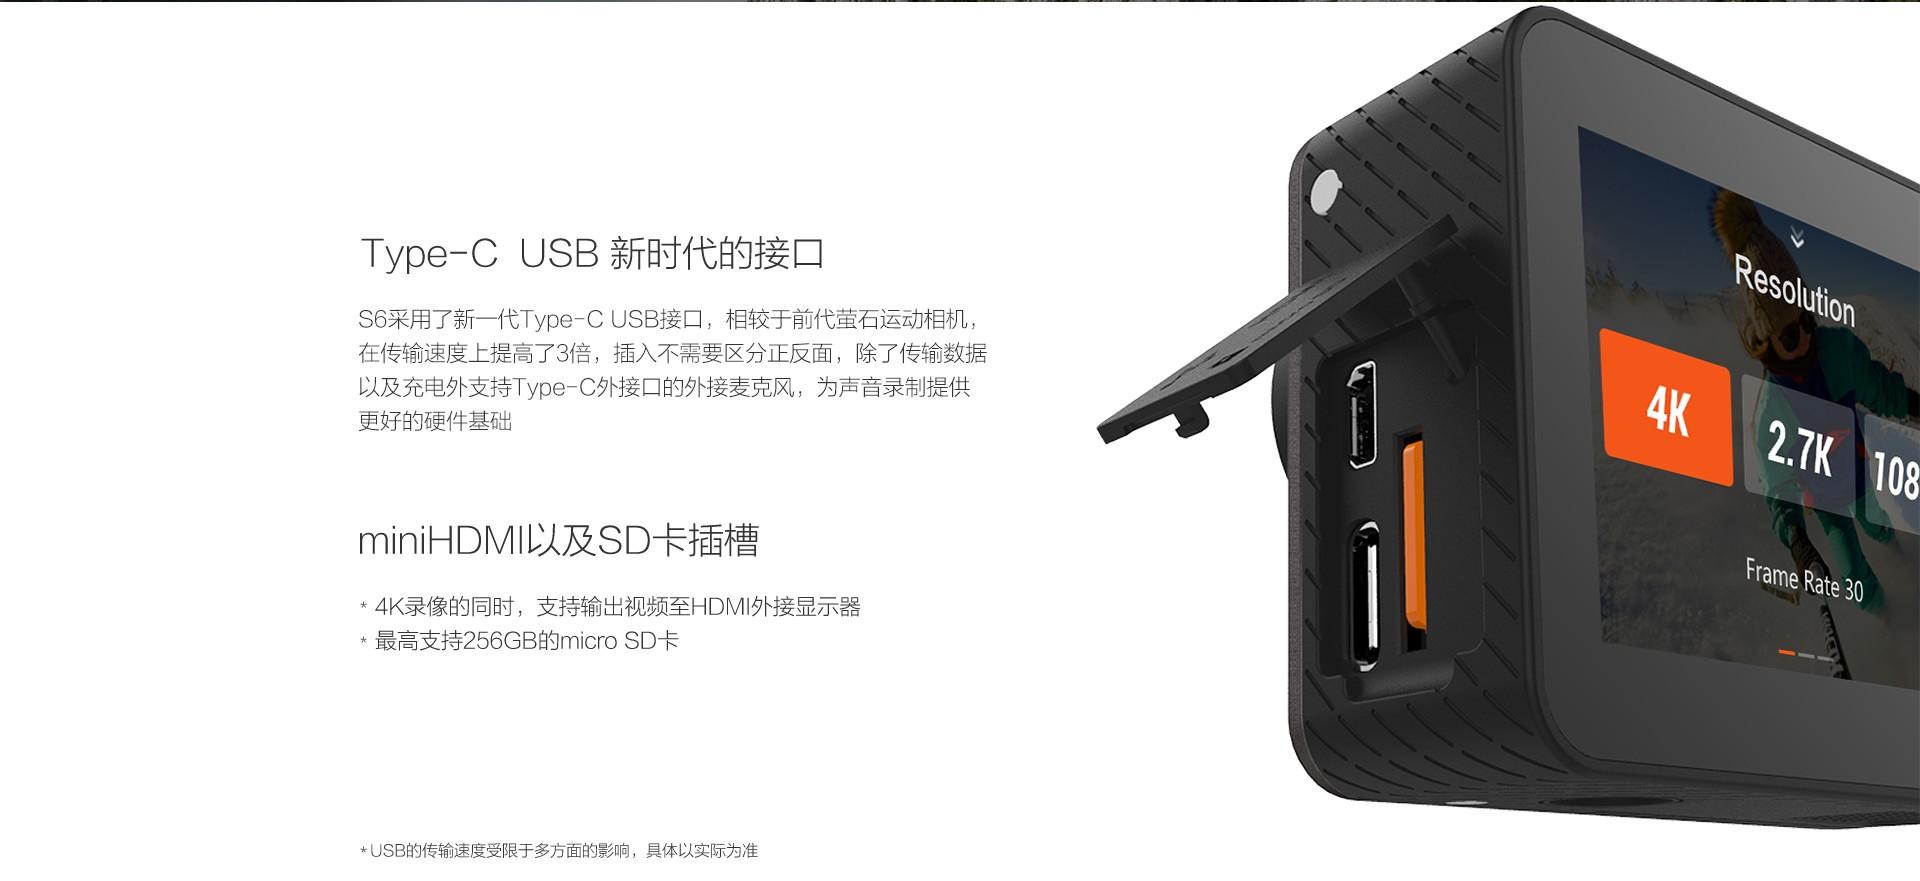 S6运动相机_web1_02.jpg